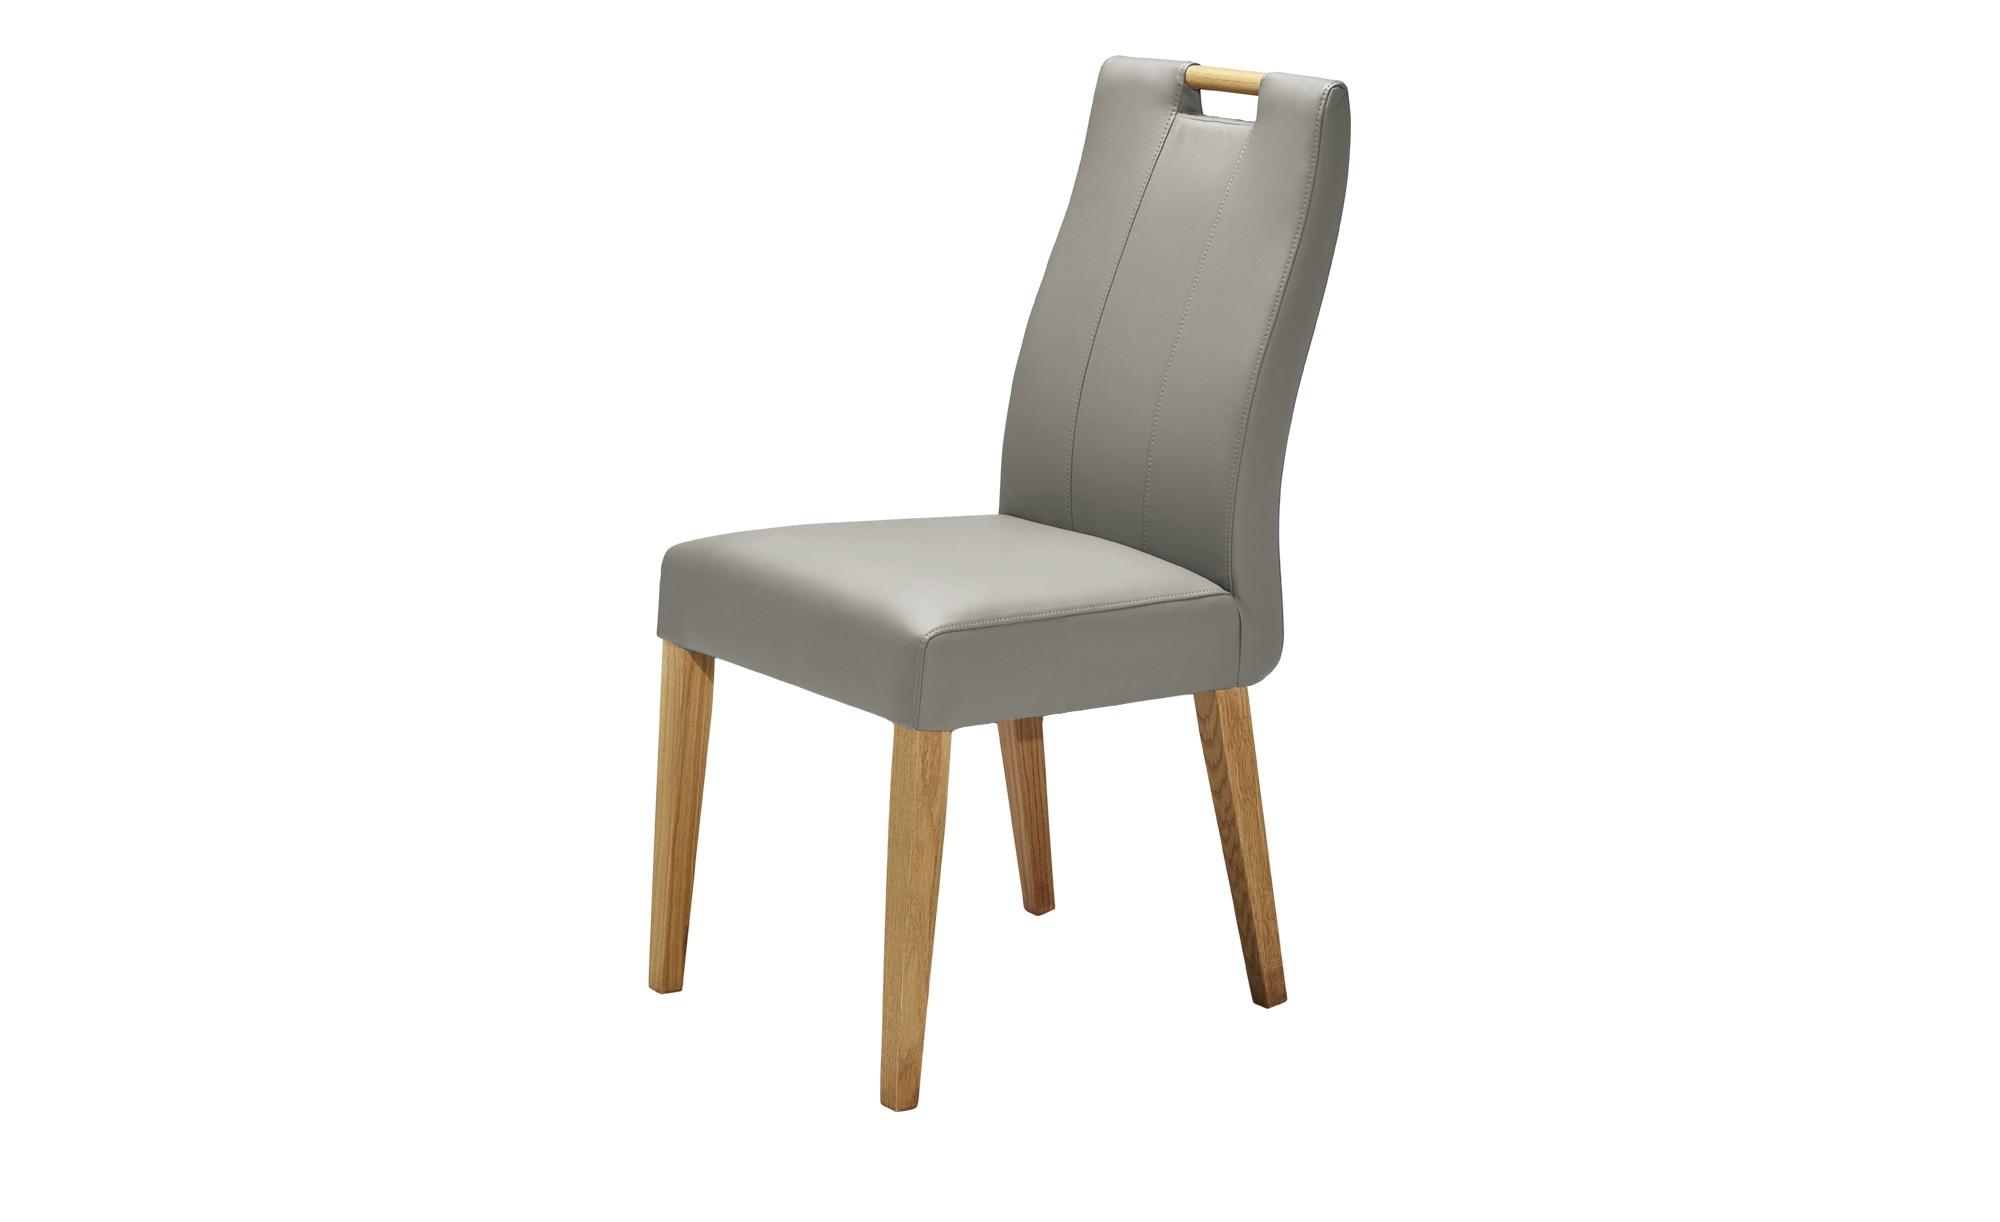 Woodford Stuhl Vivien grau 47 cm 96 cm 59 cm Stühle > Esszimmerstühle Möbel Kraft